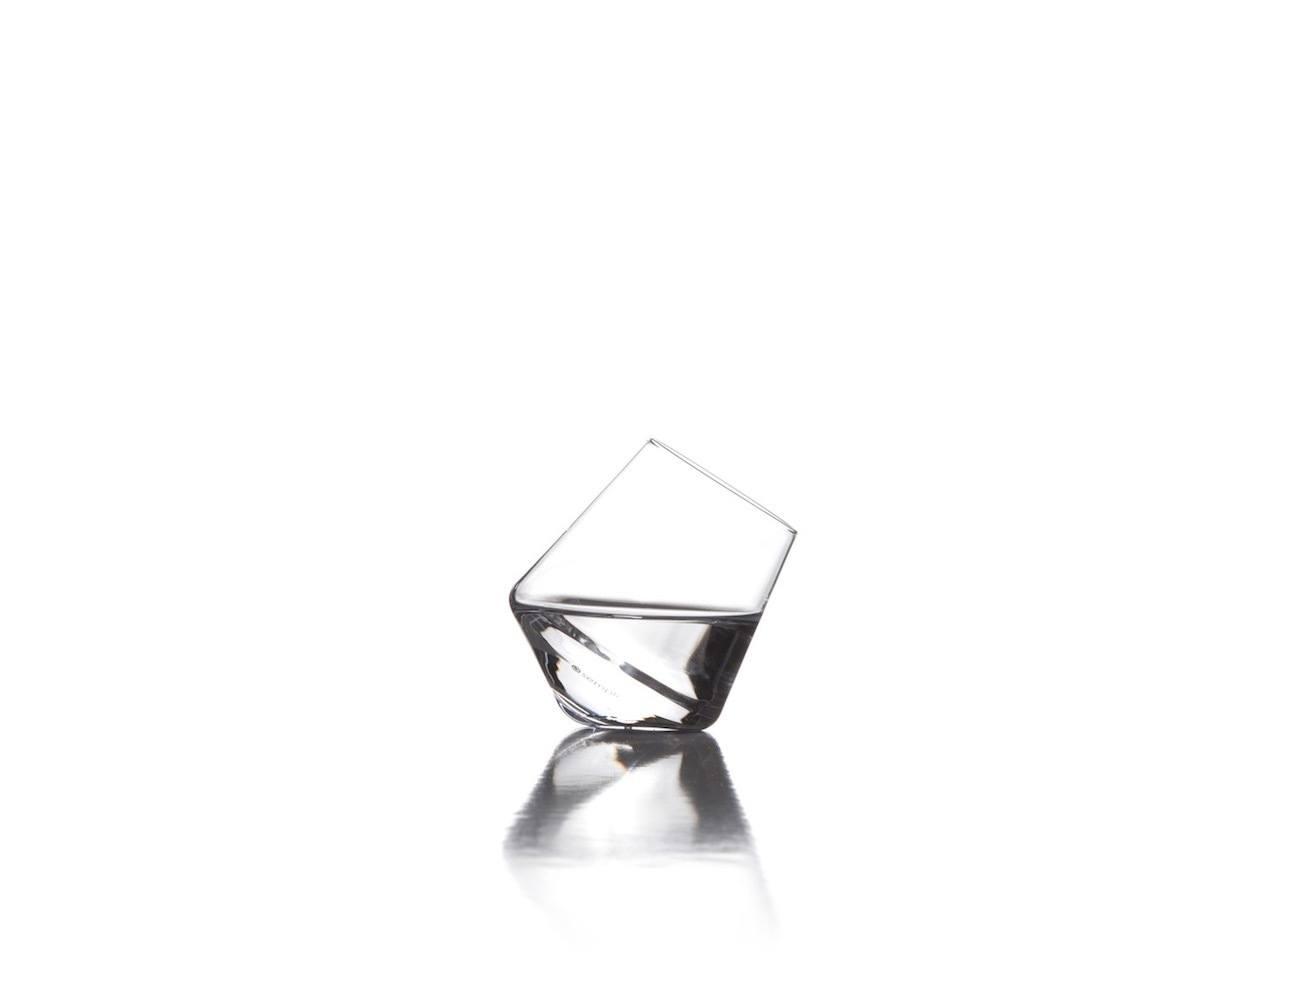 SEMPLI Cupa Balancing Shot Glasses